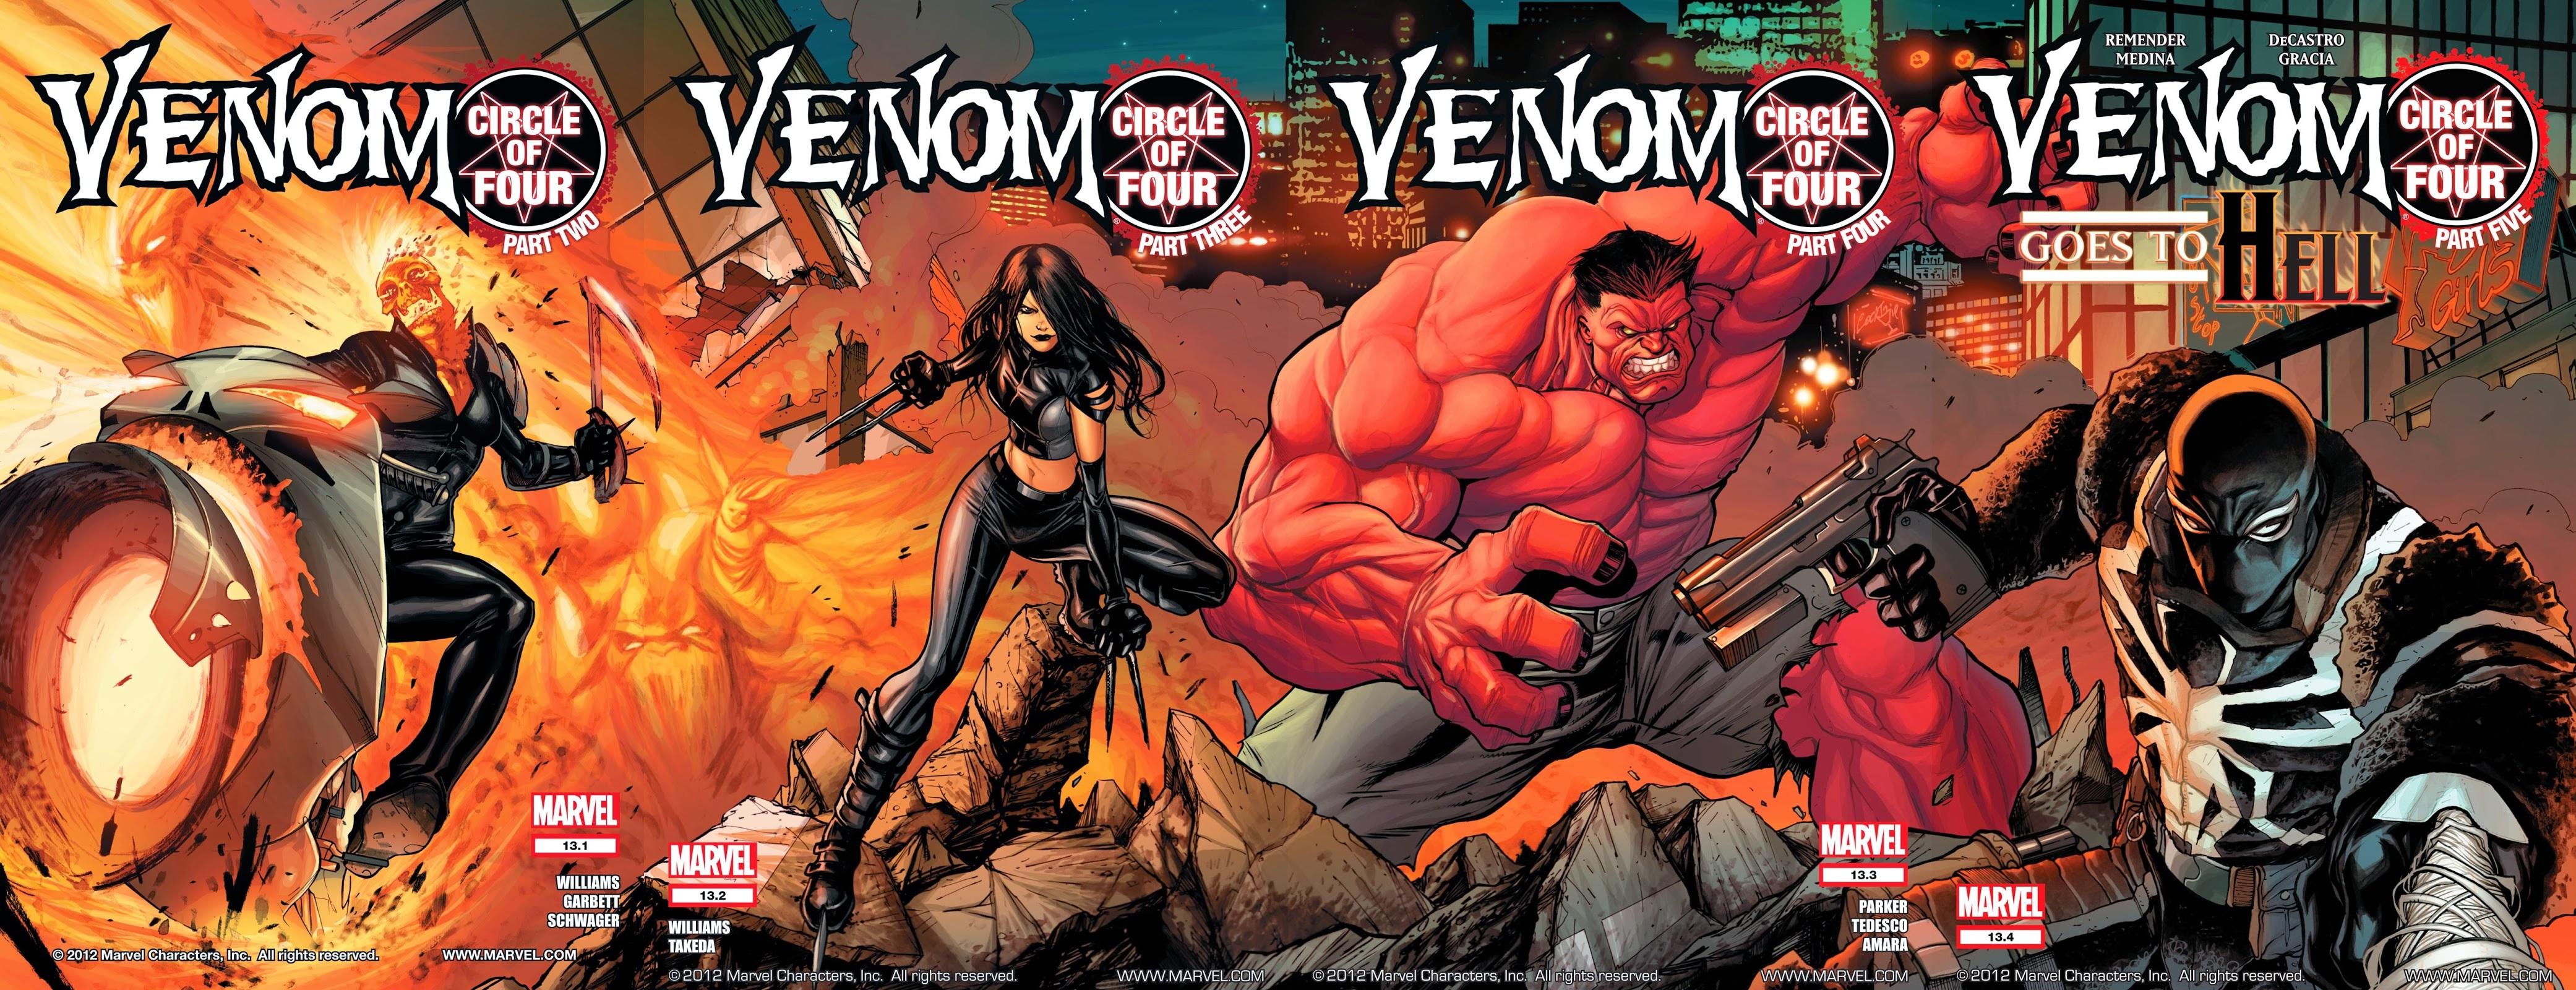 Venom Vol 2 13.1, 13.2, 13.3, and 13.4.jpg